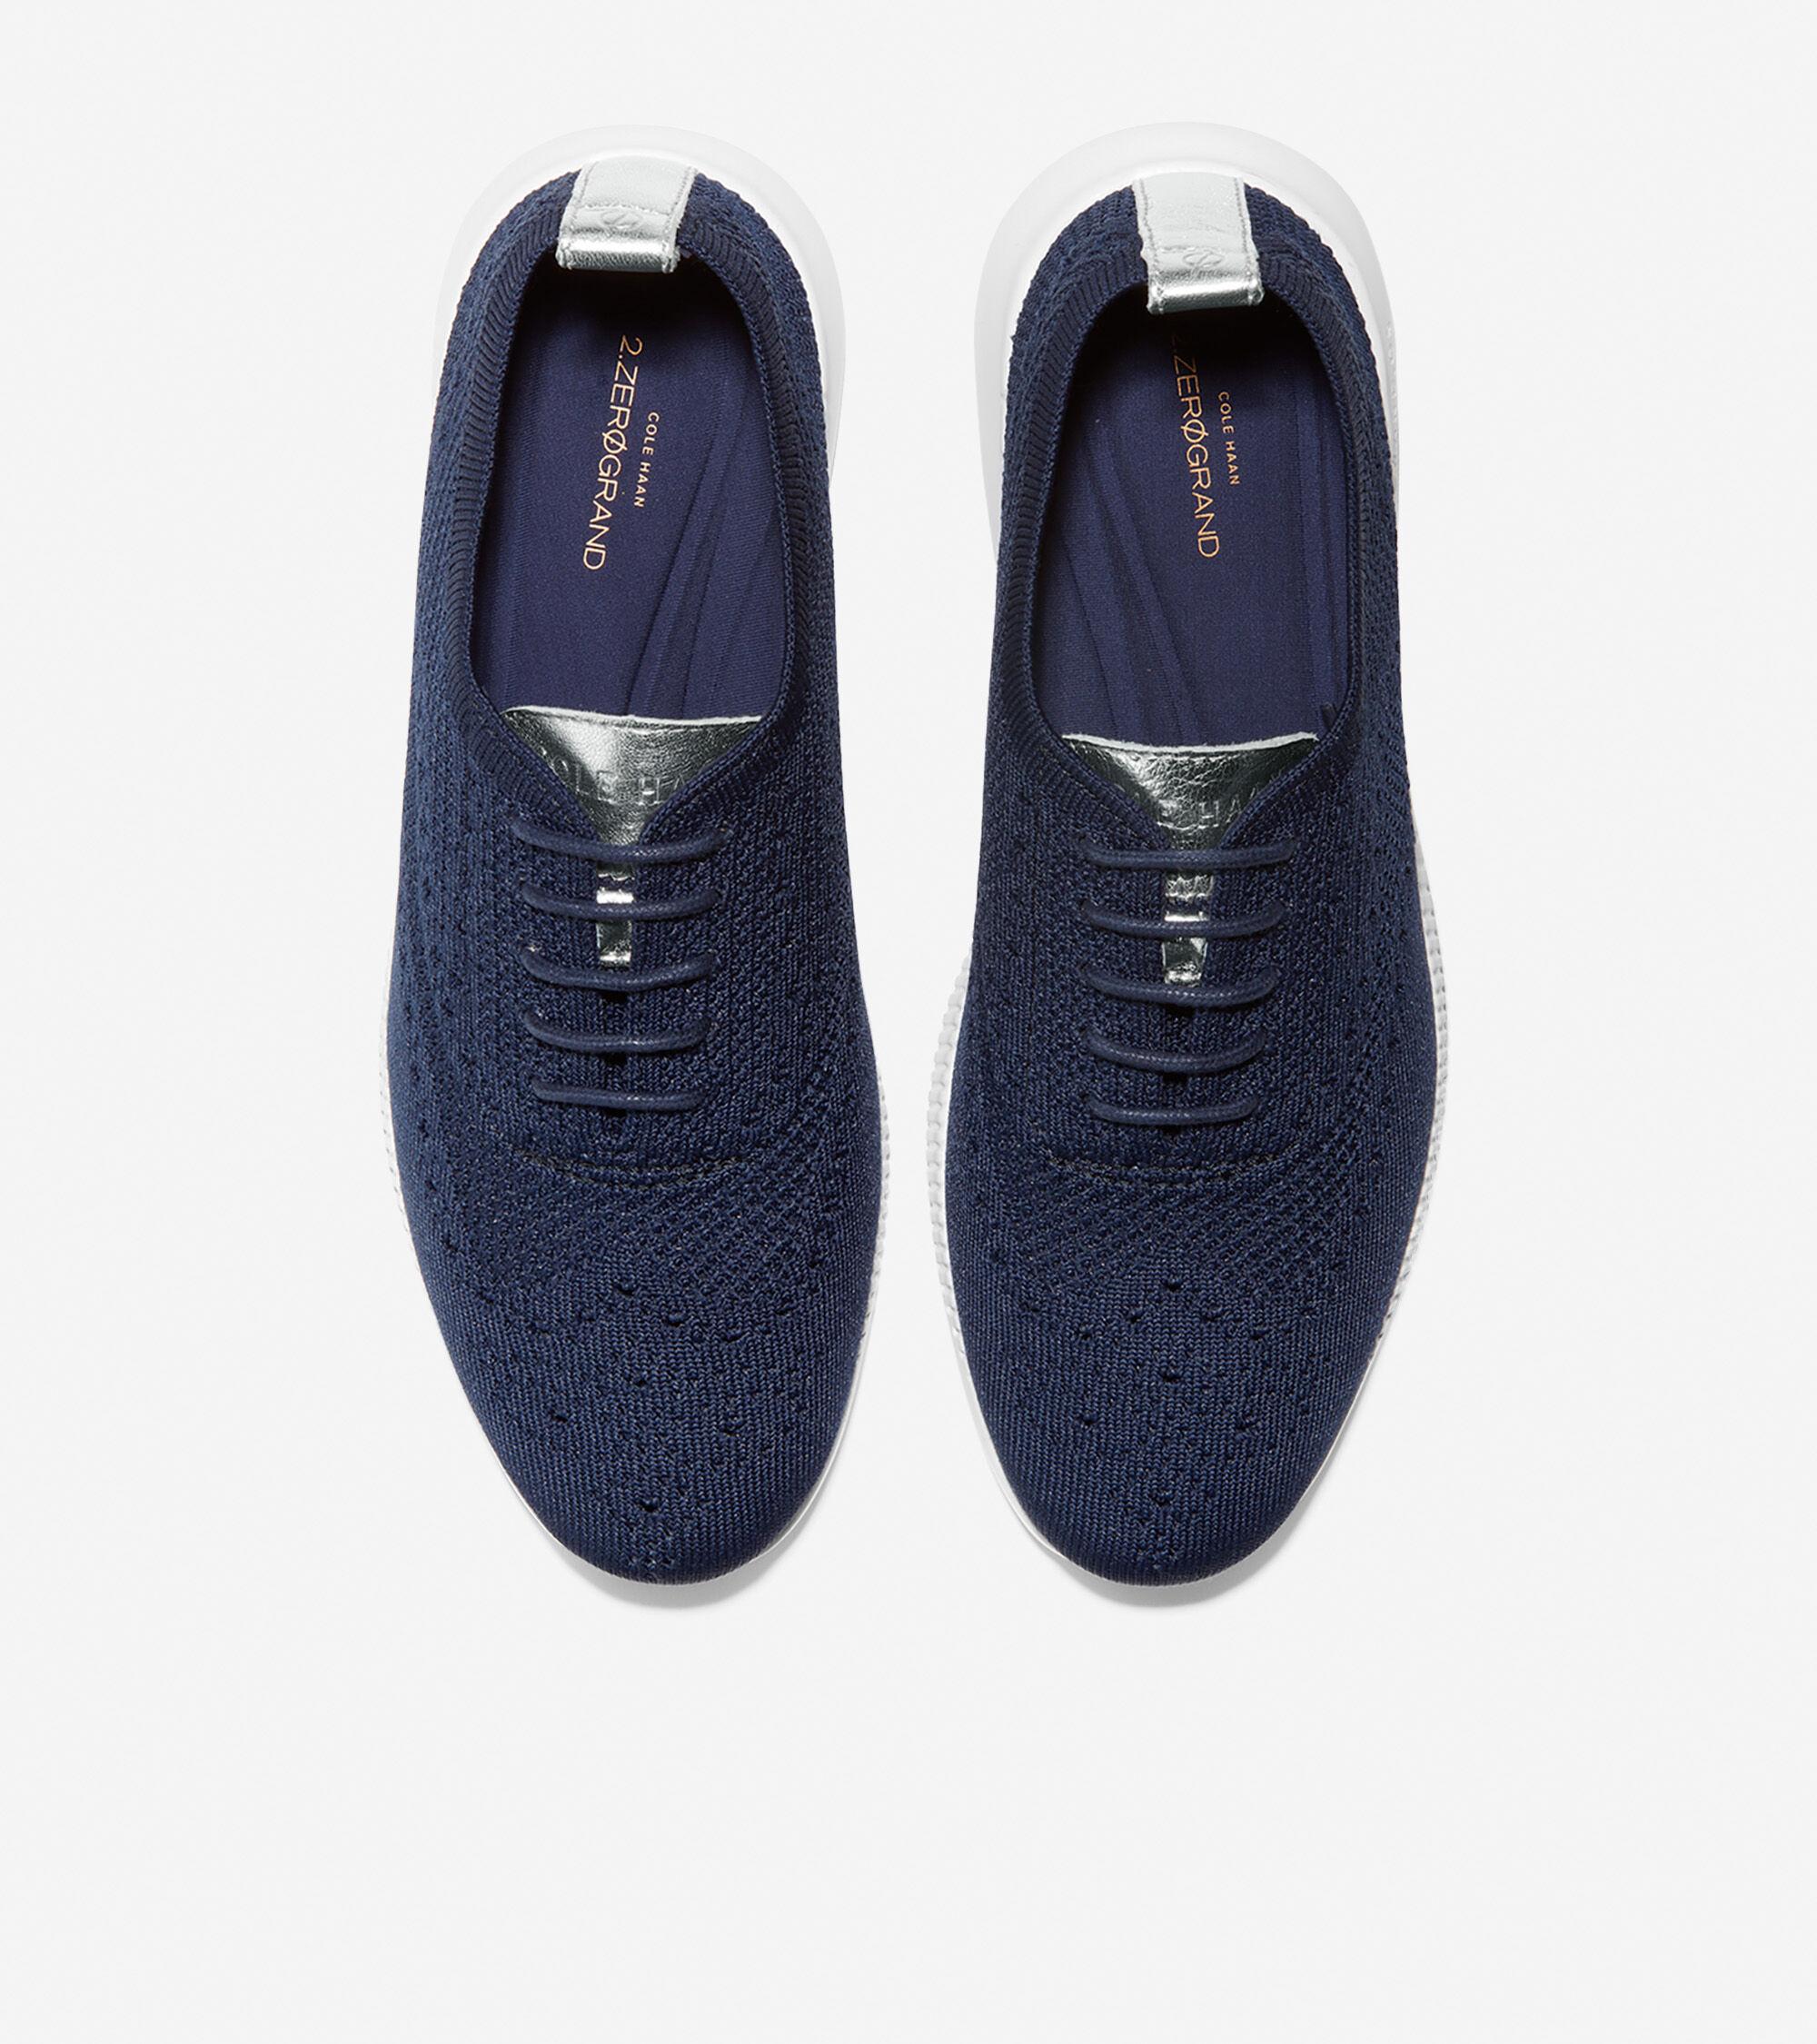 Wingtip Oxford in Marine Blue